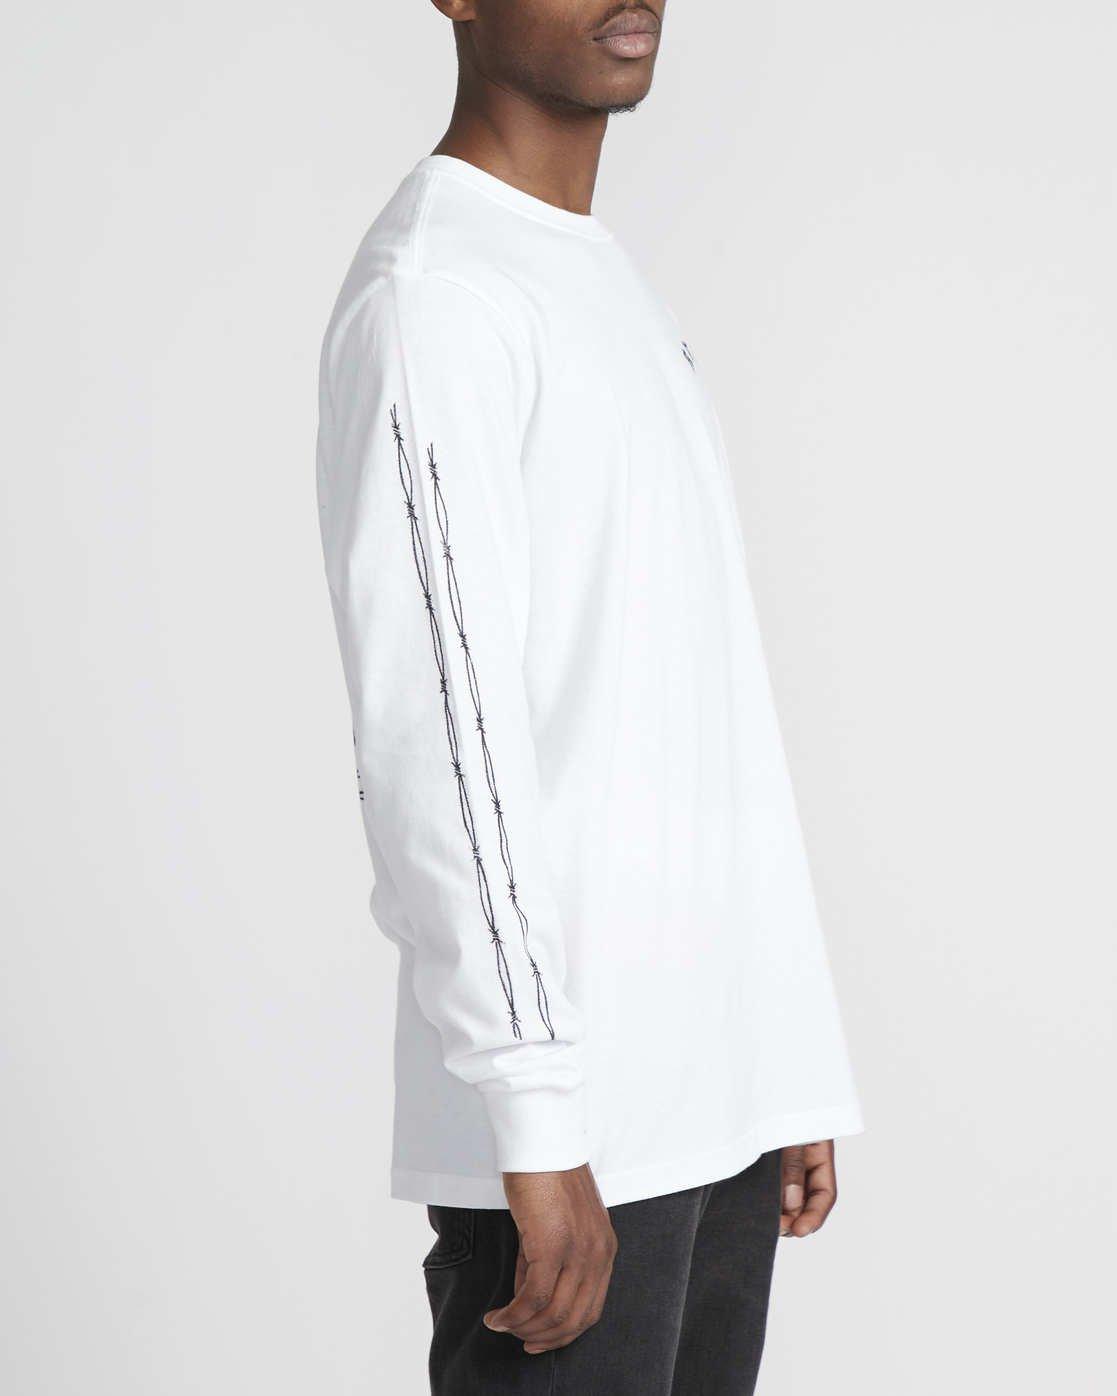 4 Benjamin Jeanjean JJ Mix  - Long Sleeve T-Shirt White Q1LSRFRVF9 RVCA